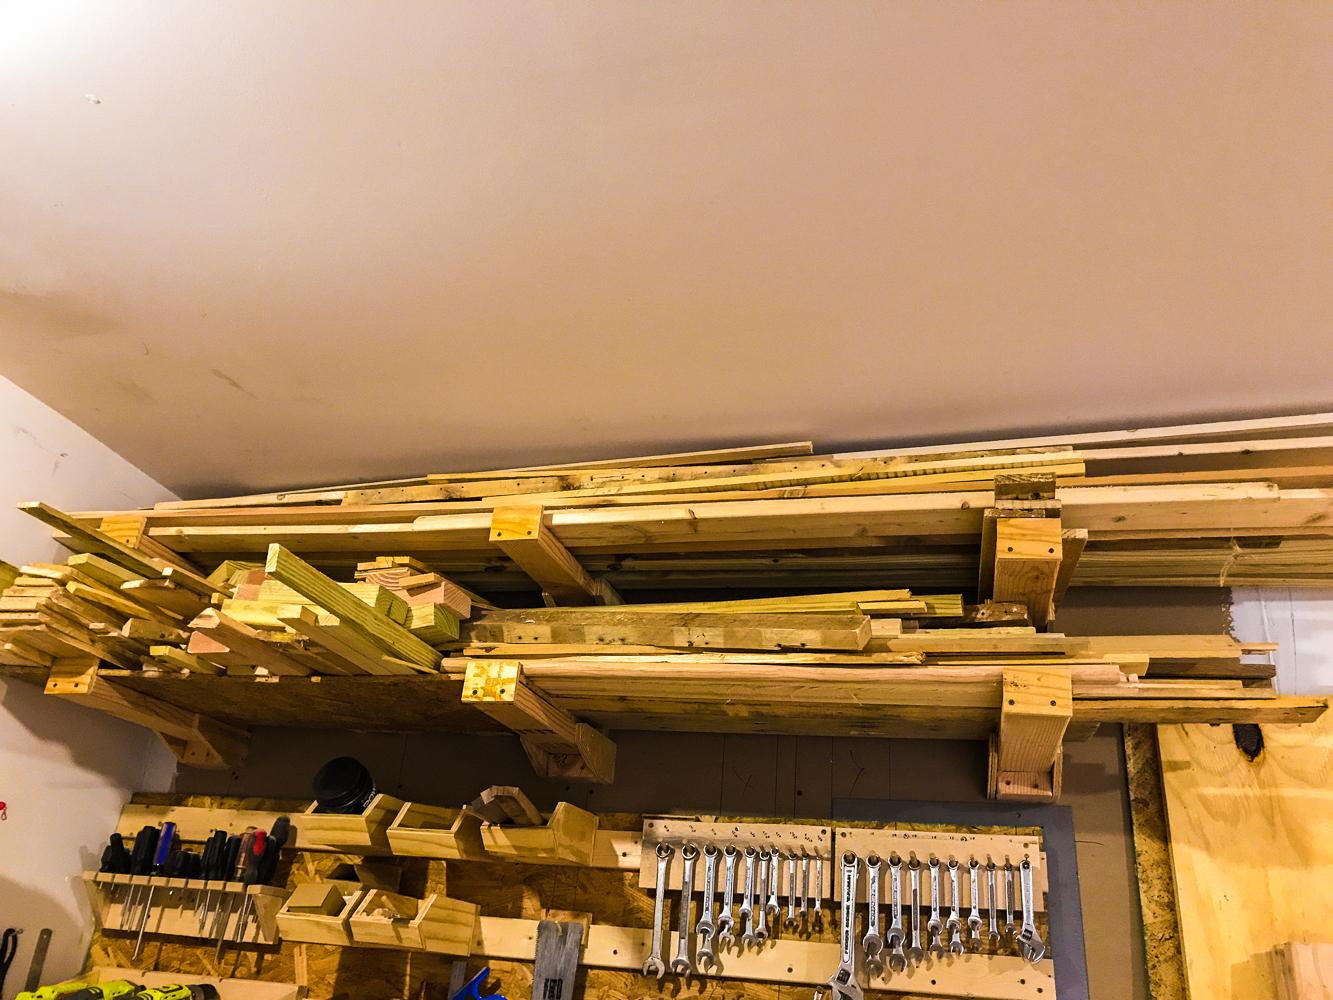 Lumber Cart - Old Lumber Rack Issues